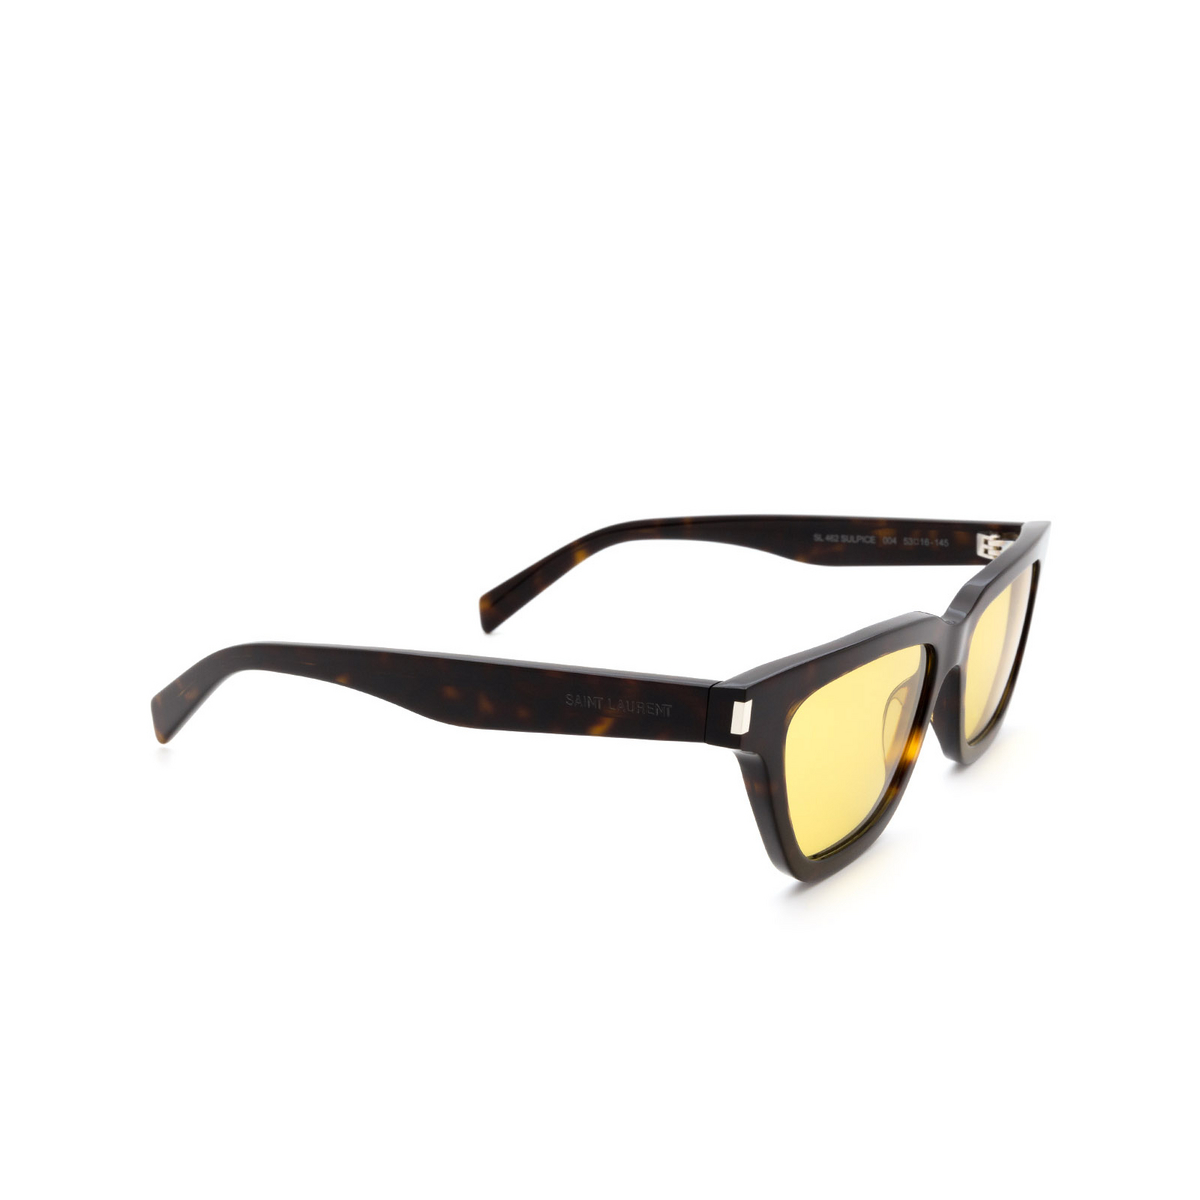 Saint Laurent® Cat-eye Sunglasses: Sulpice SL 462 color Havana 004 - three-quarters view.